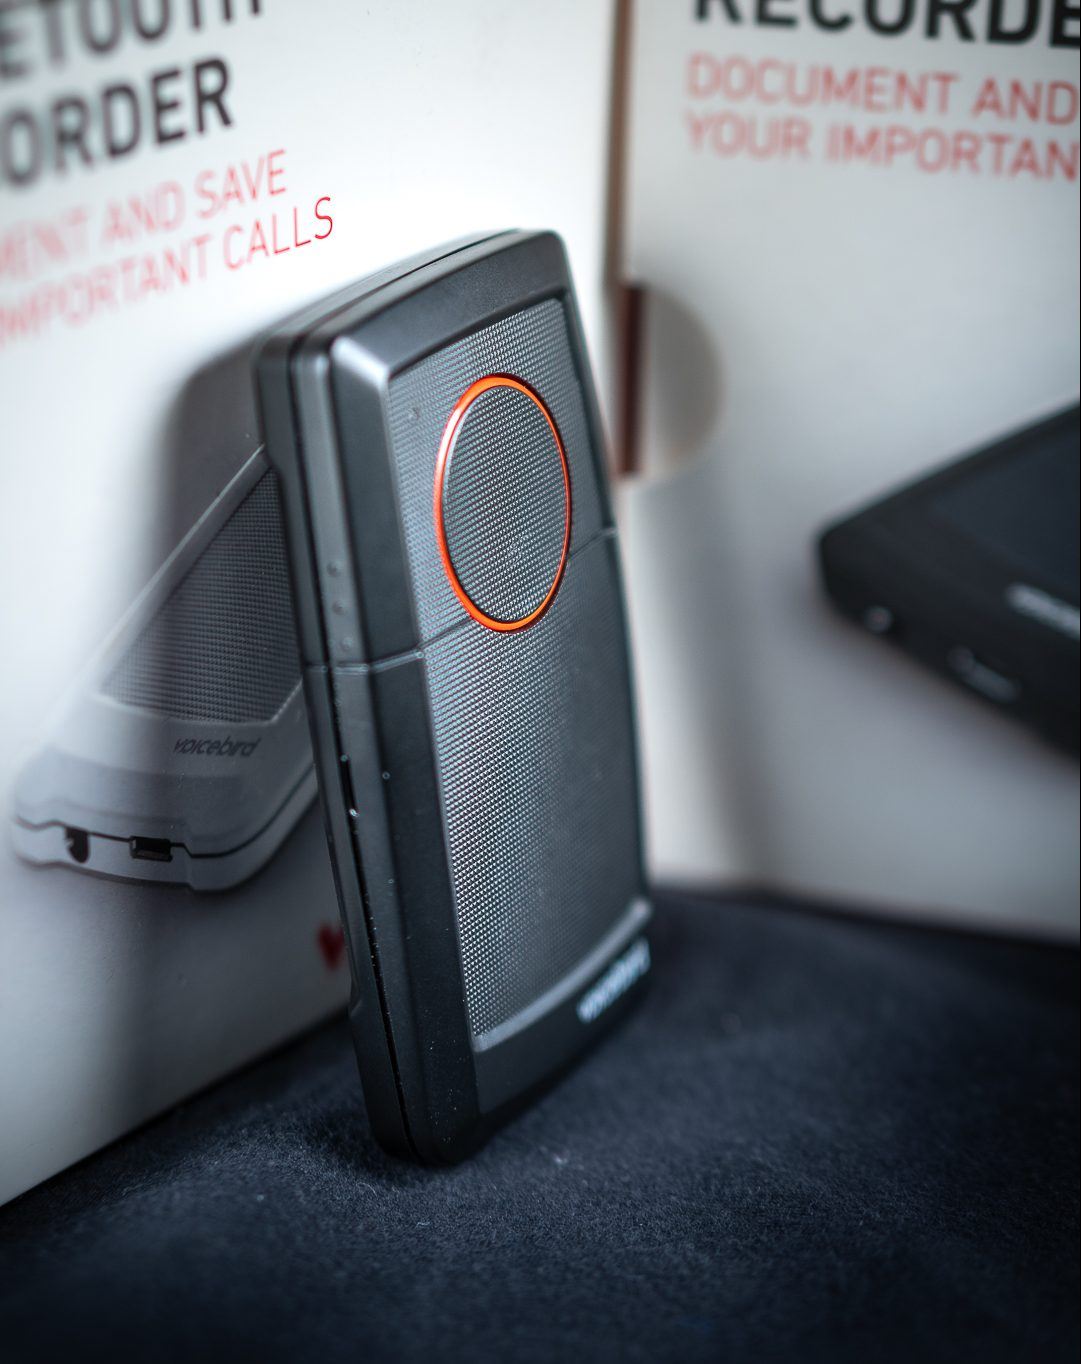 ECT - Wireless Audio Recording, VoiceBird